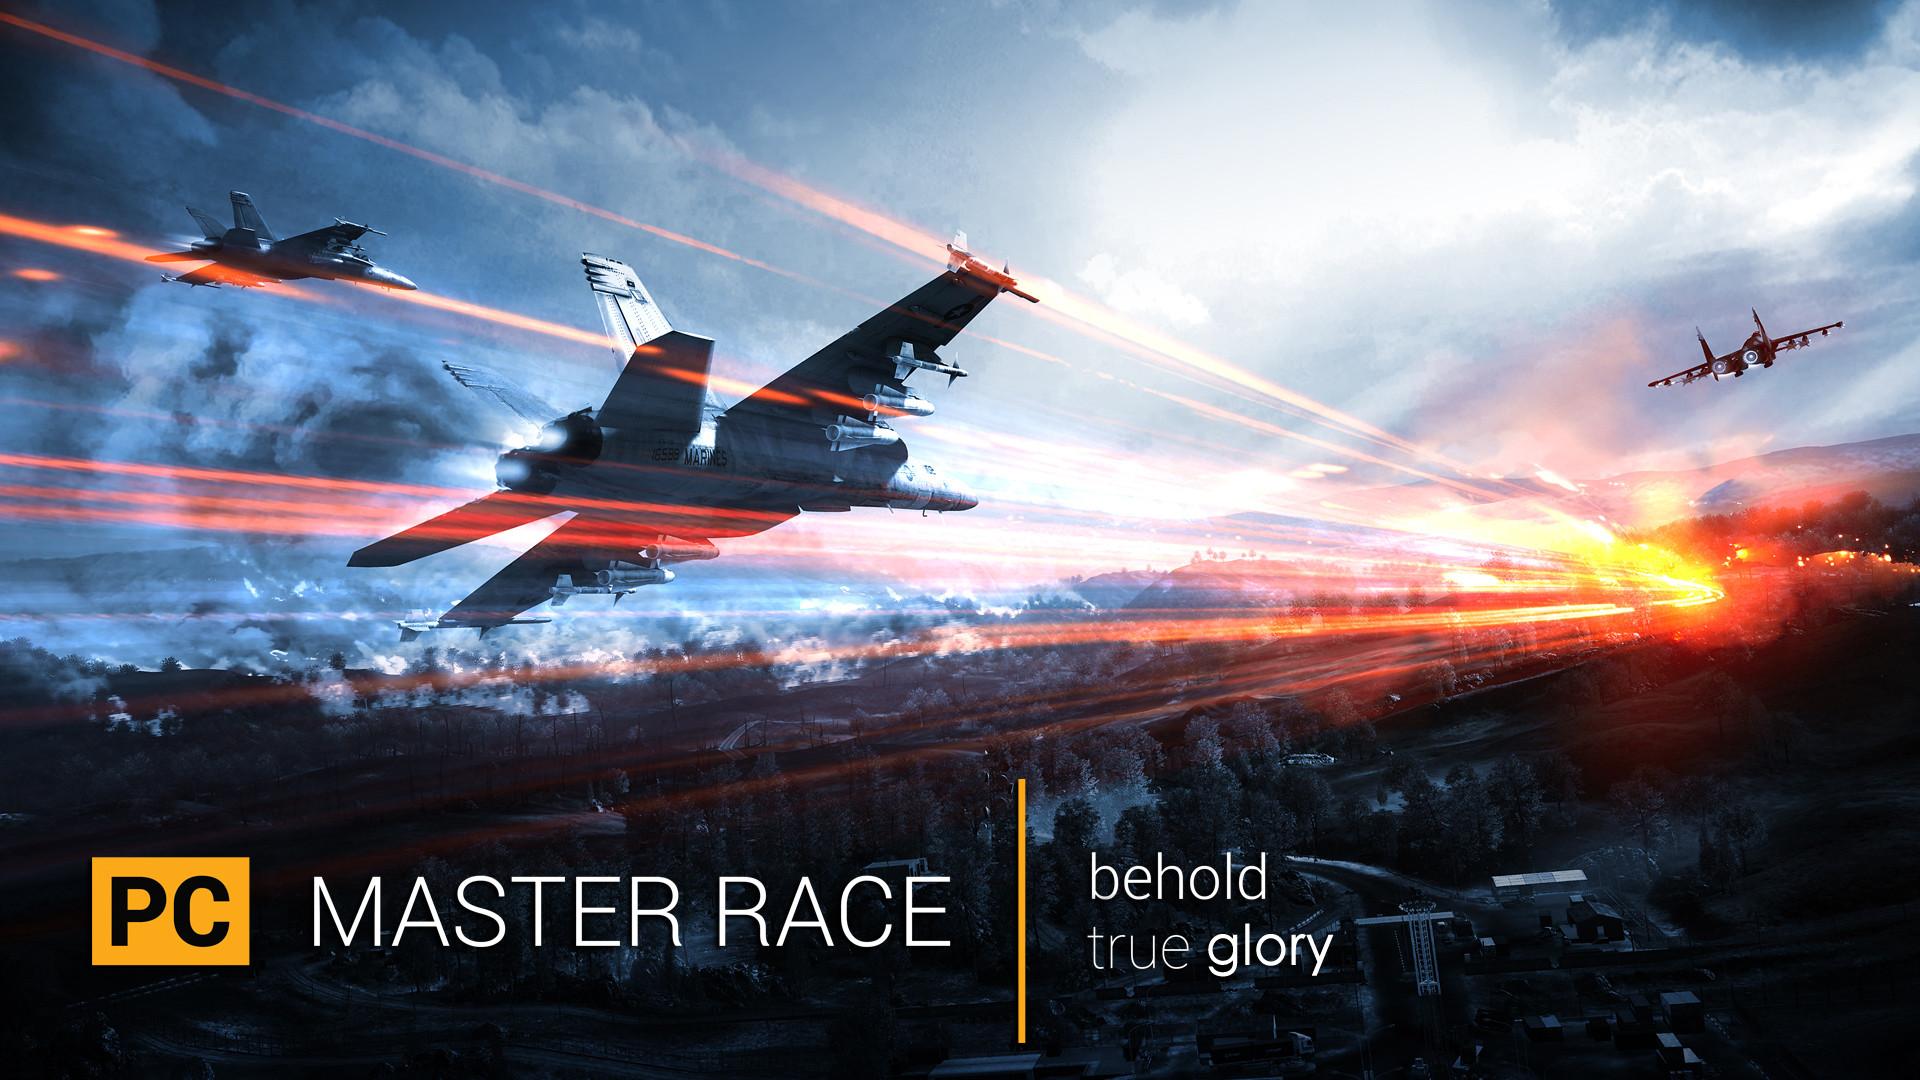 Pc Master Race Wallpaper 4k